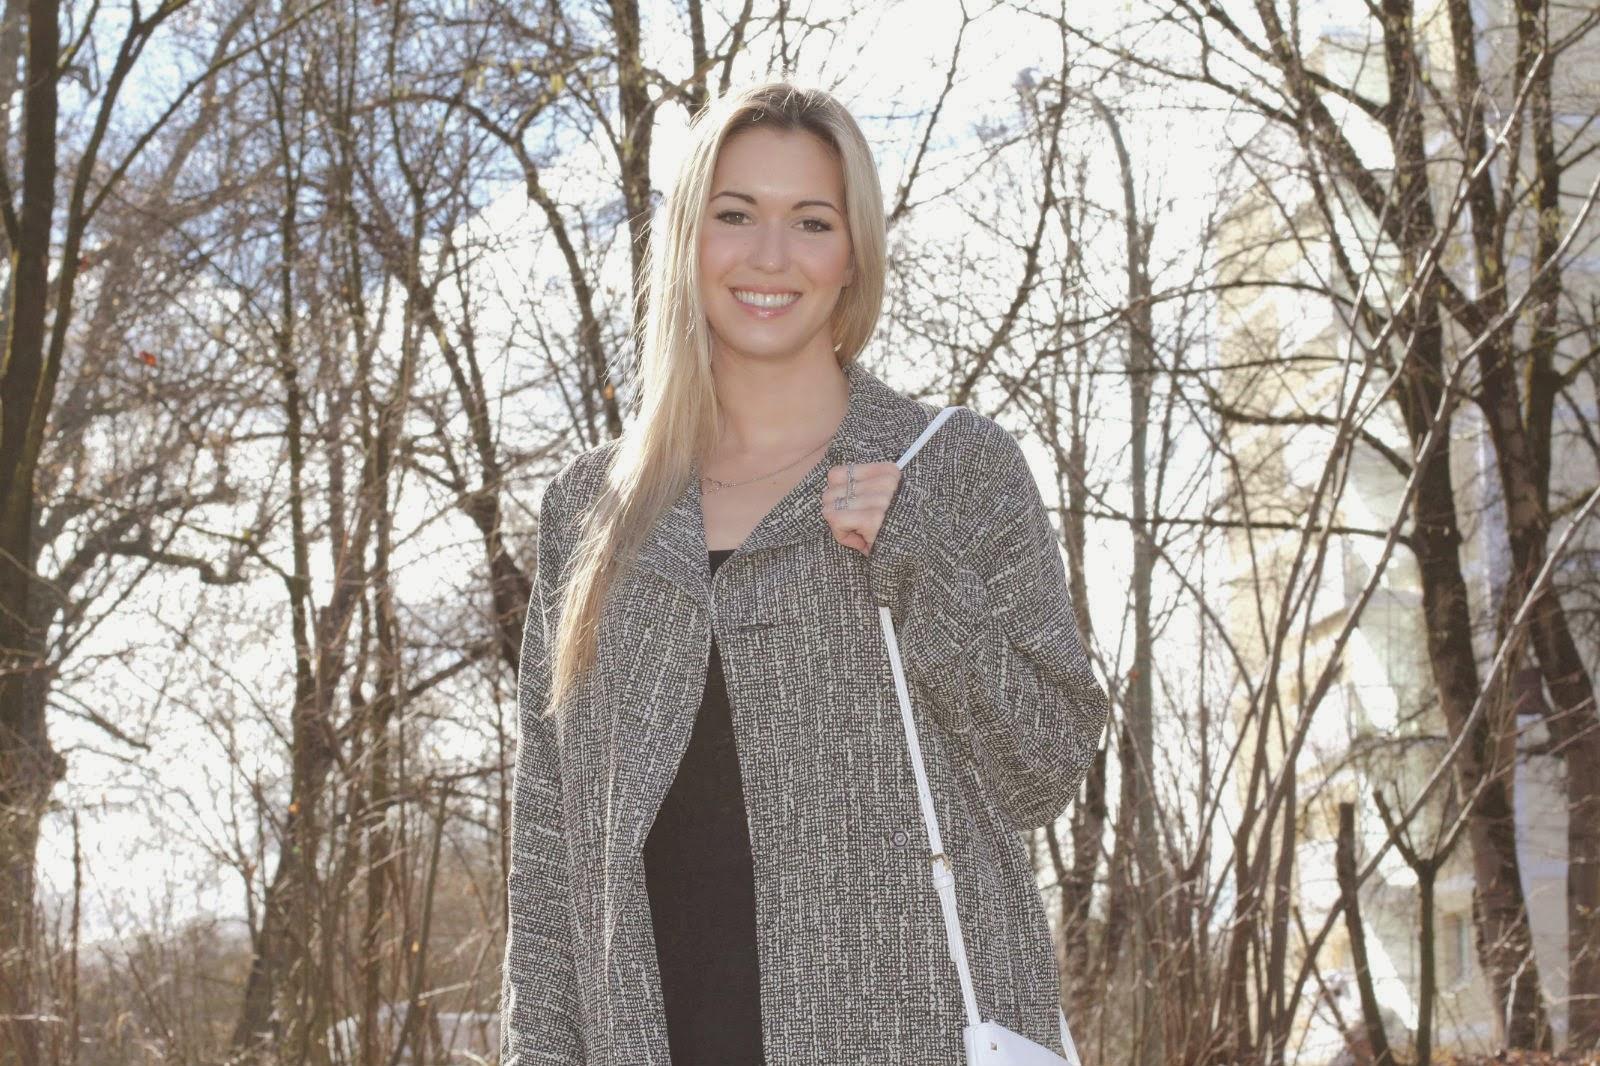 Modeblog, Fashion Blog, Pazi, Ronny Philp Freundin